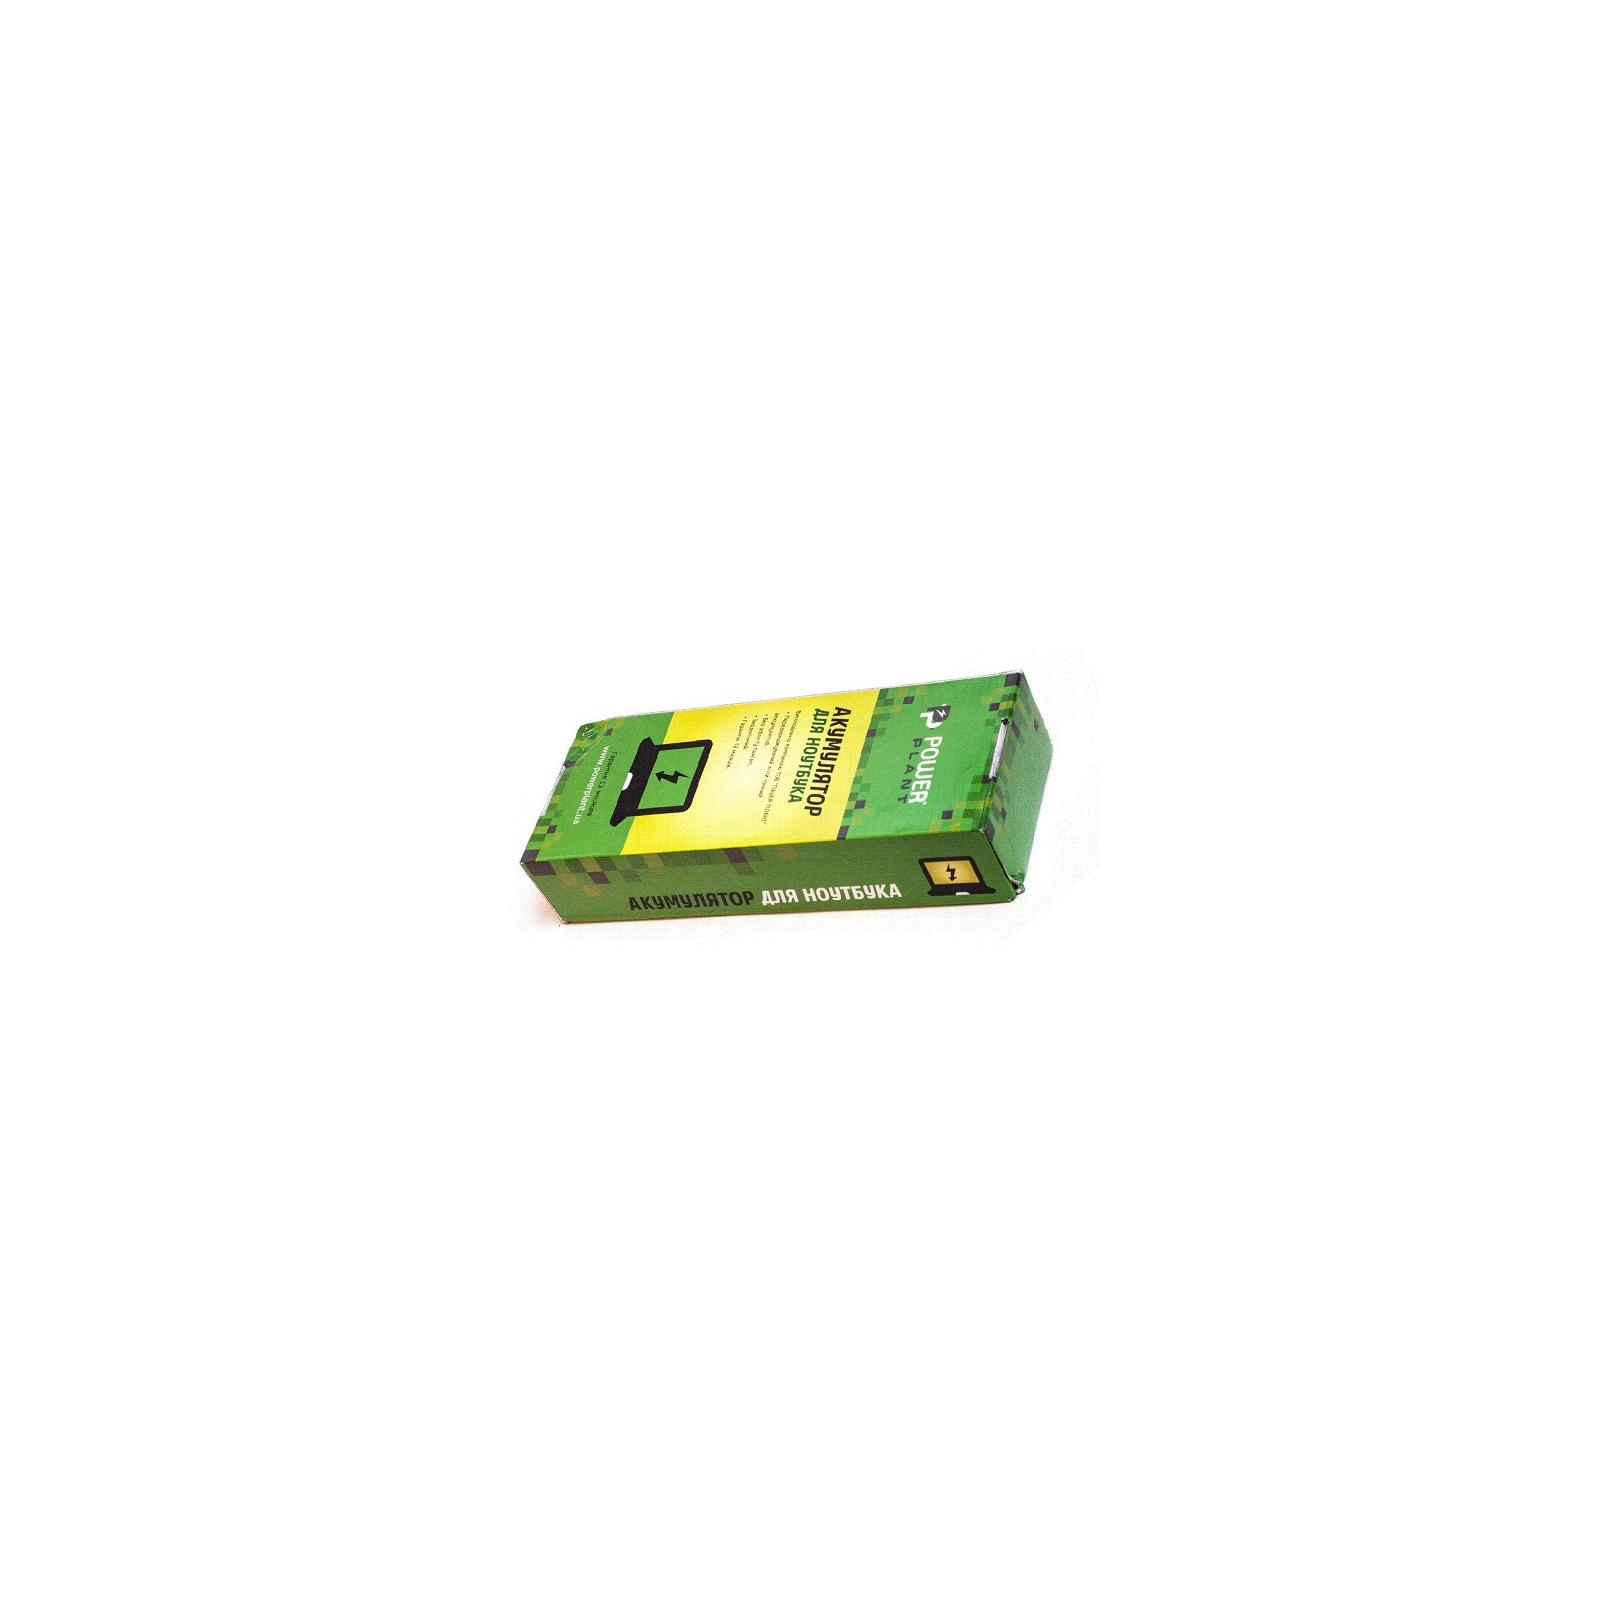 Аккумулятор для ноутбука DELL Vostro 1320 (N956C, DE 1320 3S2P) 11.1V 5200mAh PowerPlant (NB00000108) изображение 3